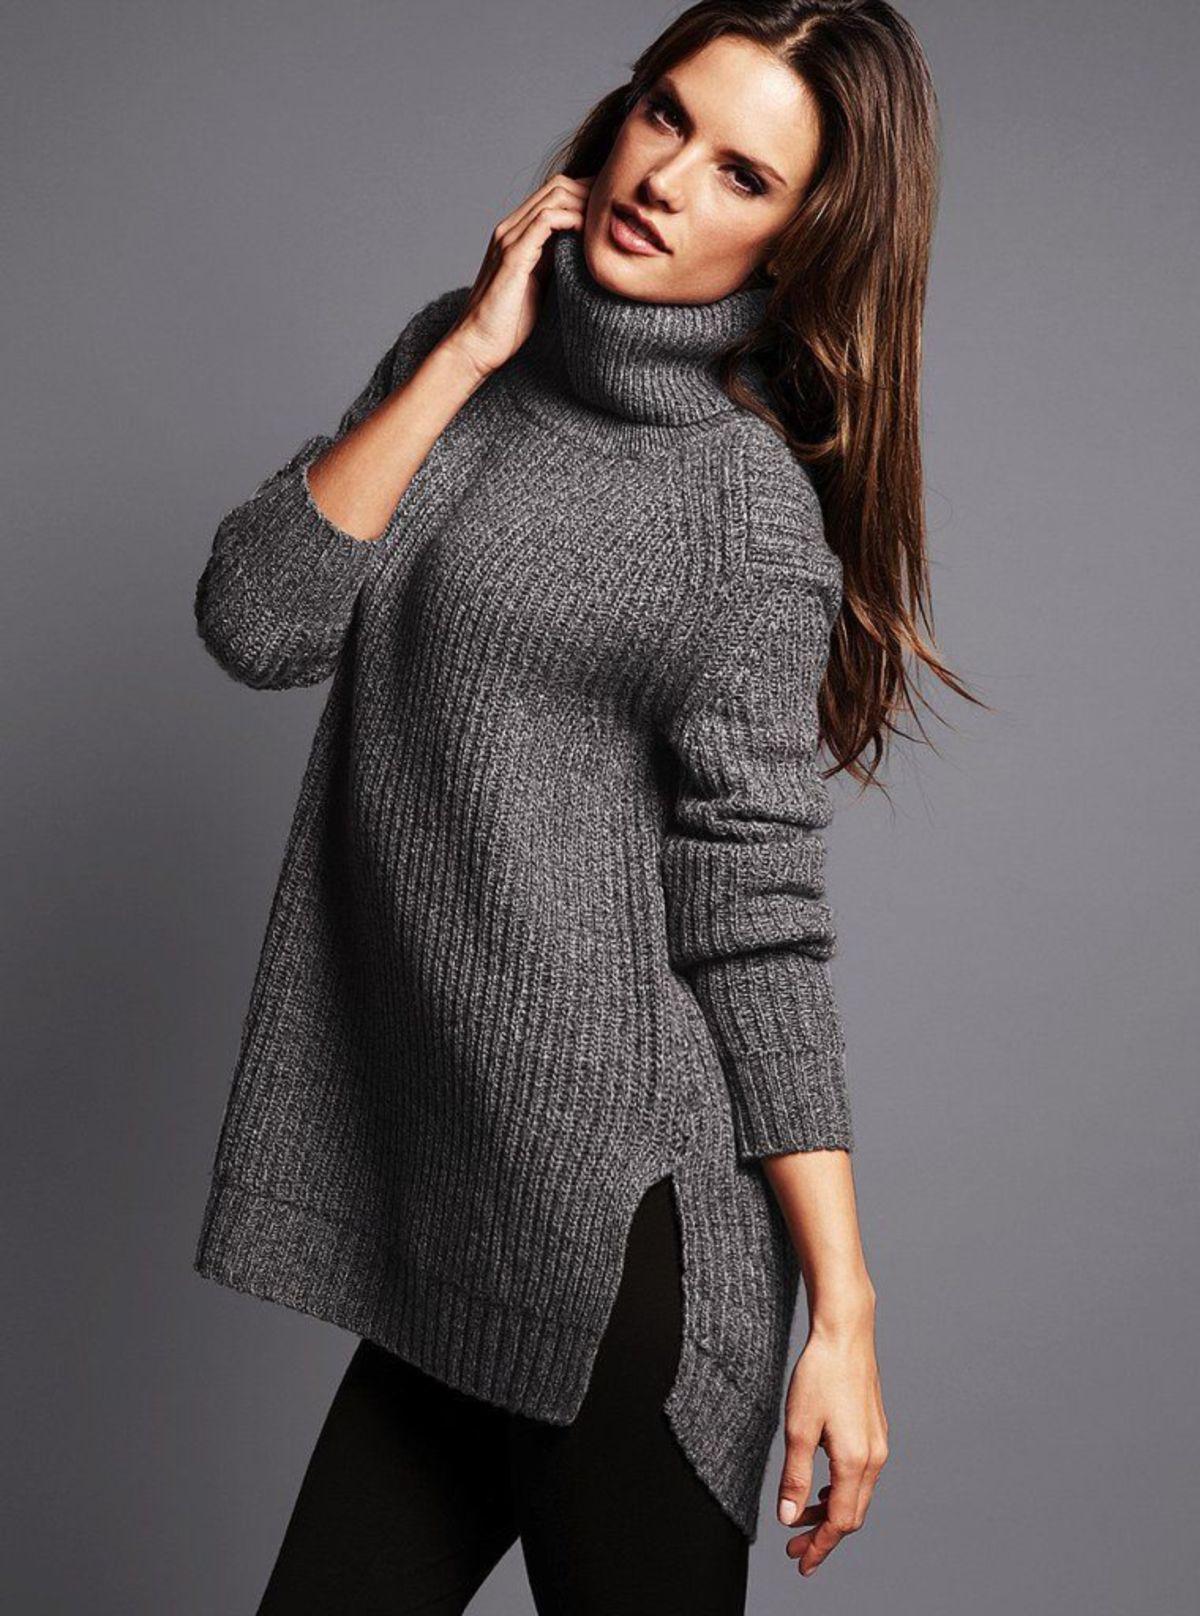 7e2af6e9019 100 фото новинок  Модные женские свитера